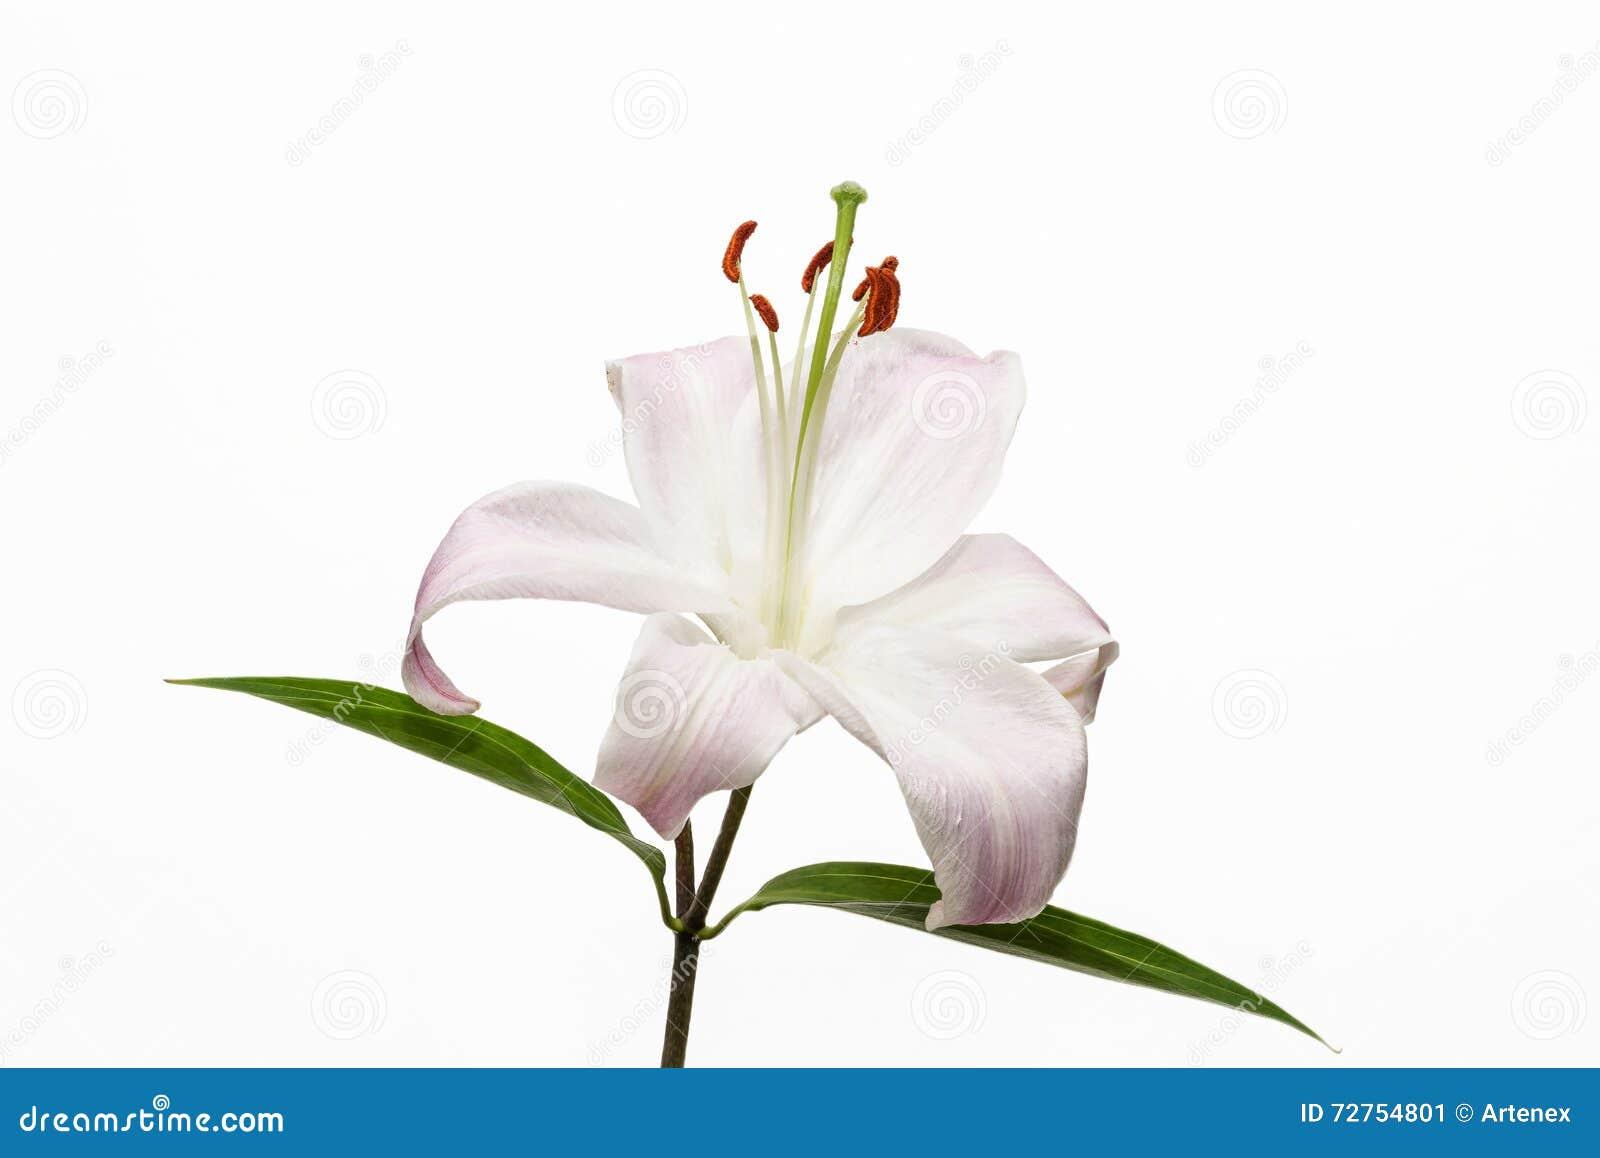 Lírio Pétala aberta da flor bonita Flor branca brilhante da flor Flor de florescência no fundo branco isolado